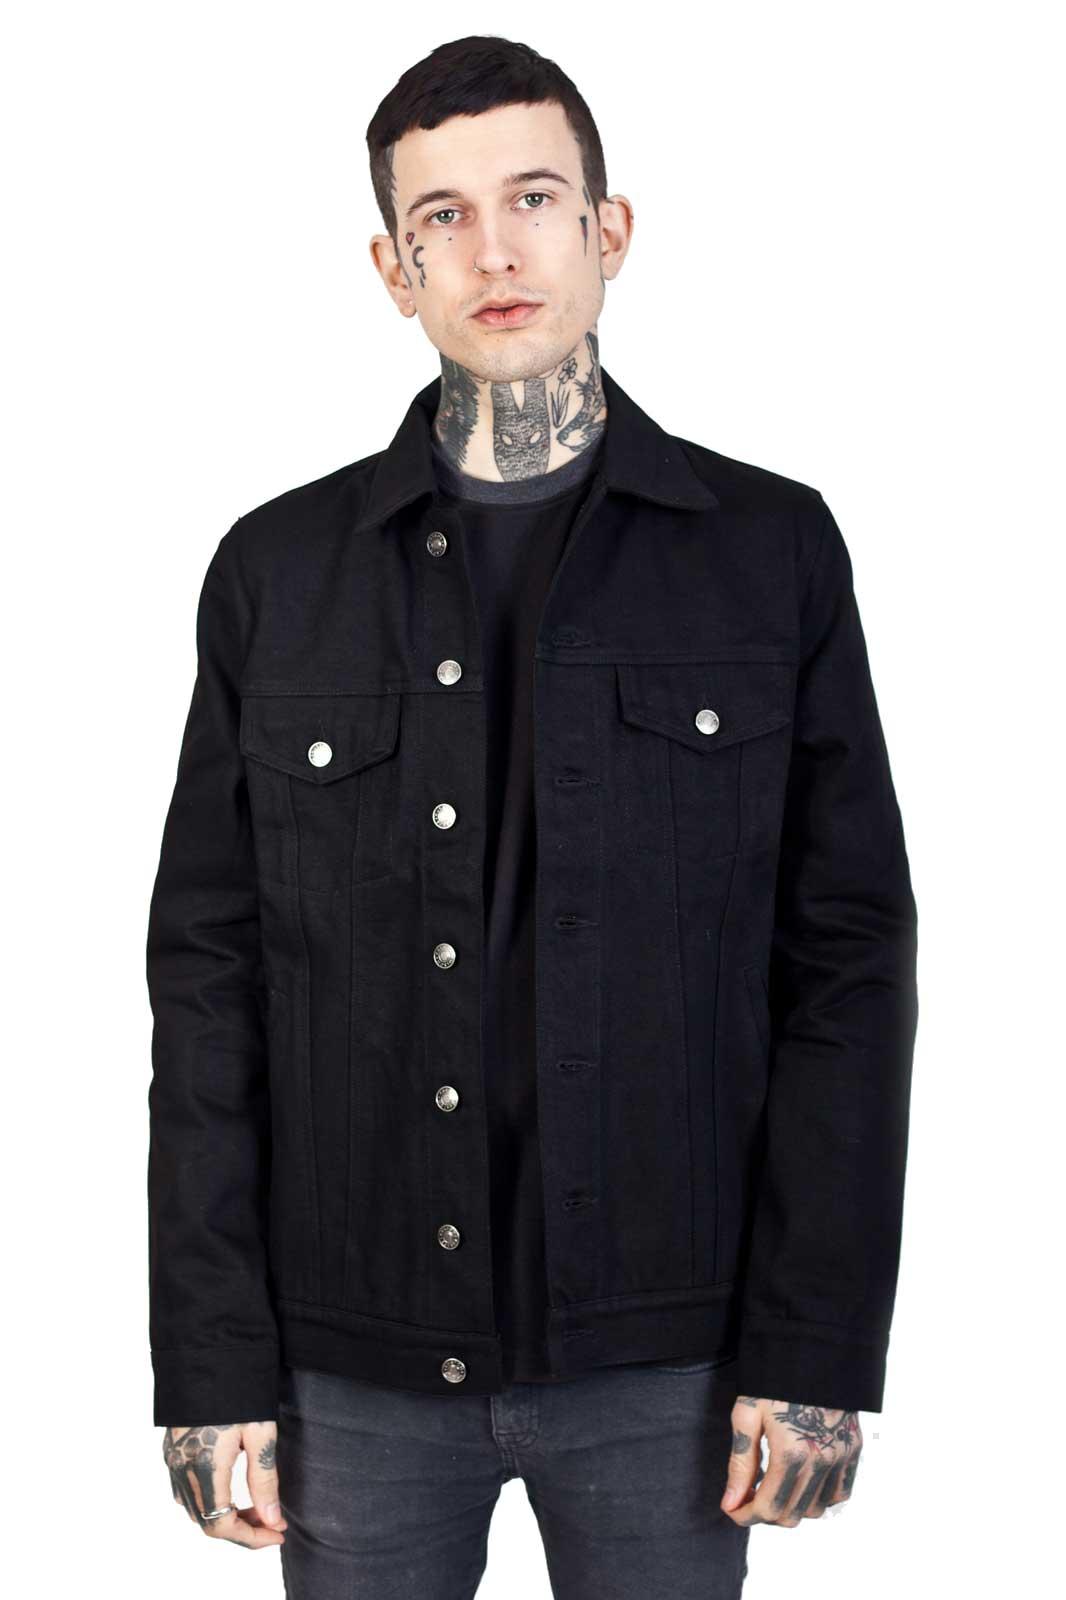 Kustom Creeps Denim Jacket front